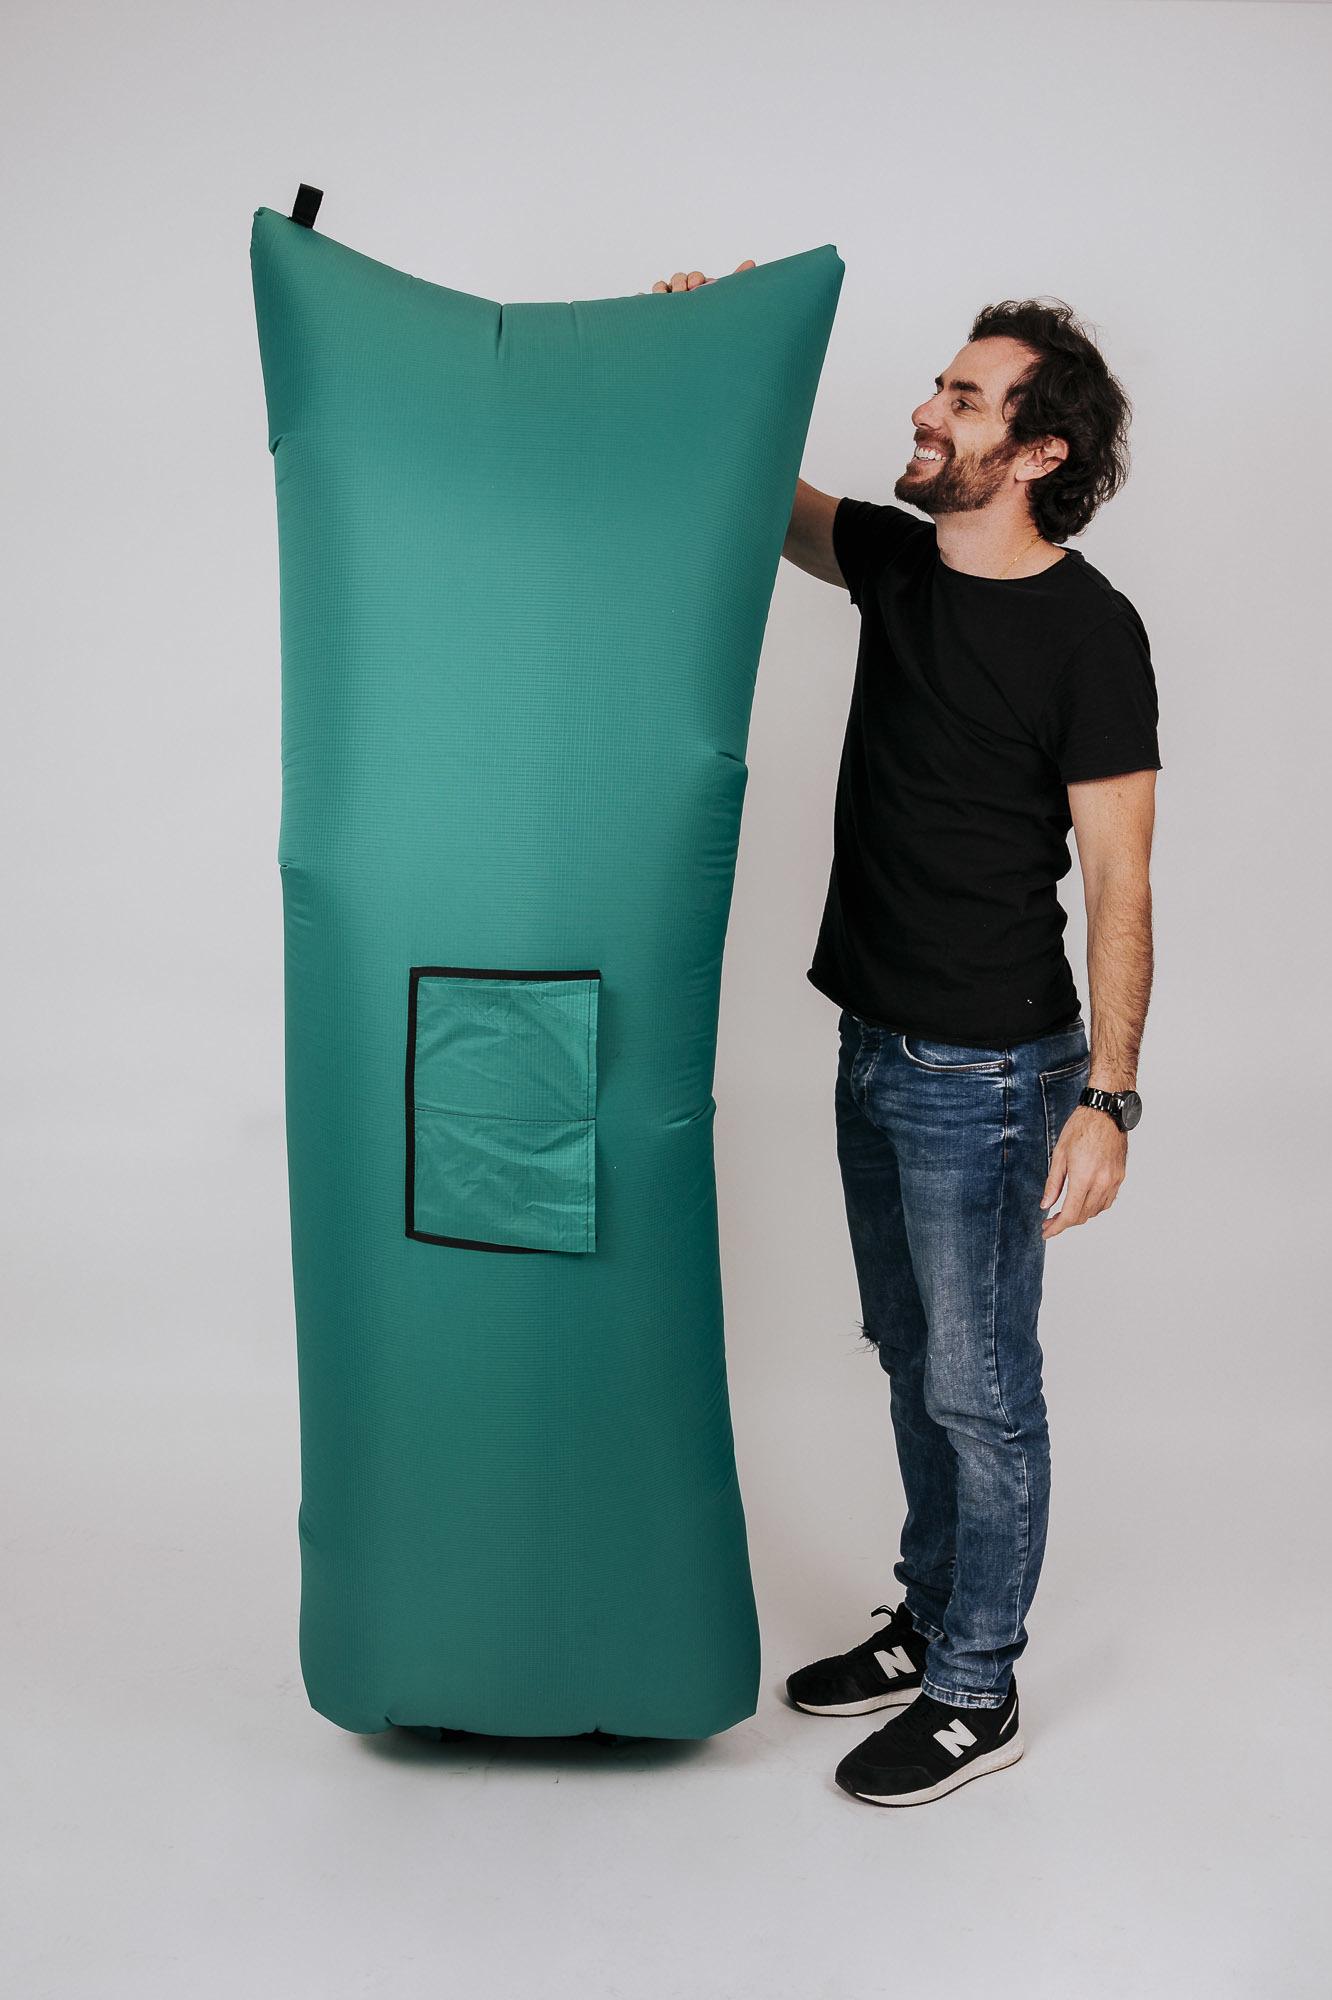 Hug One Verde Turquesa